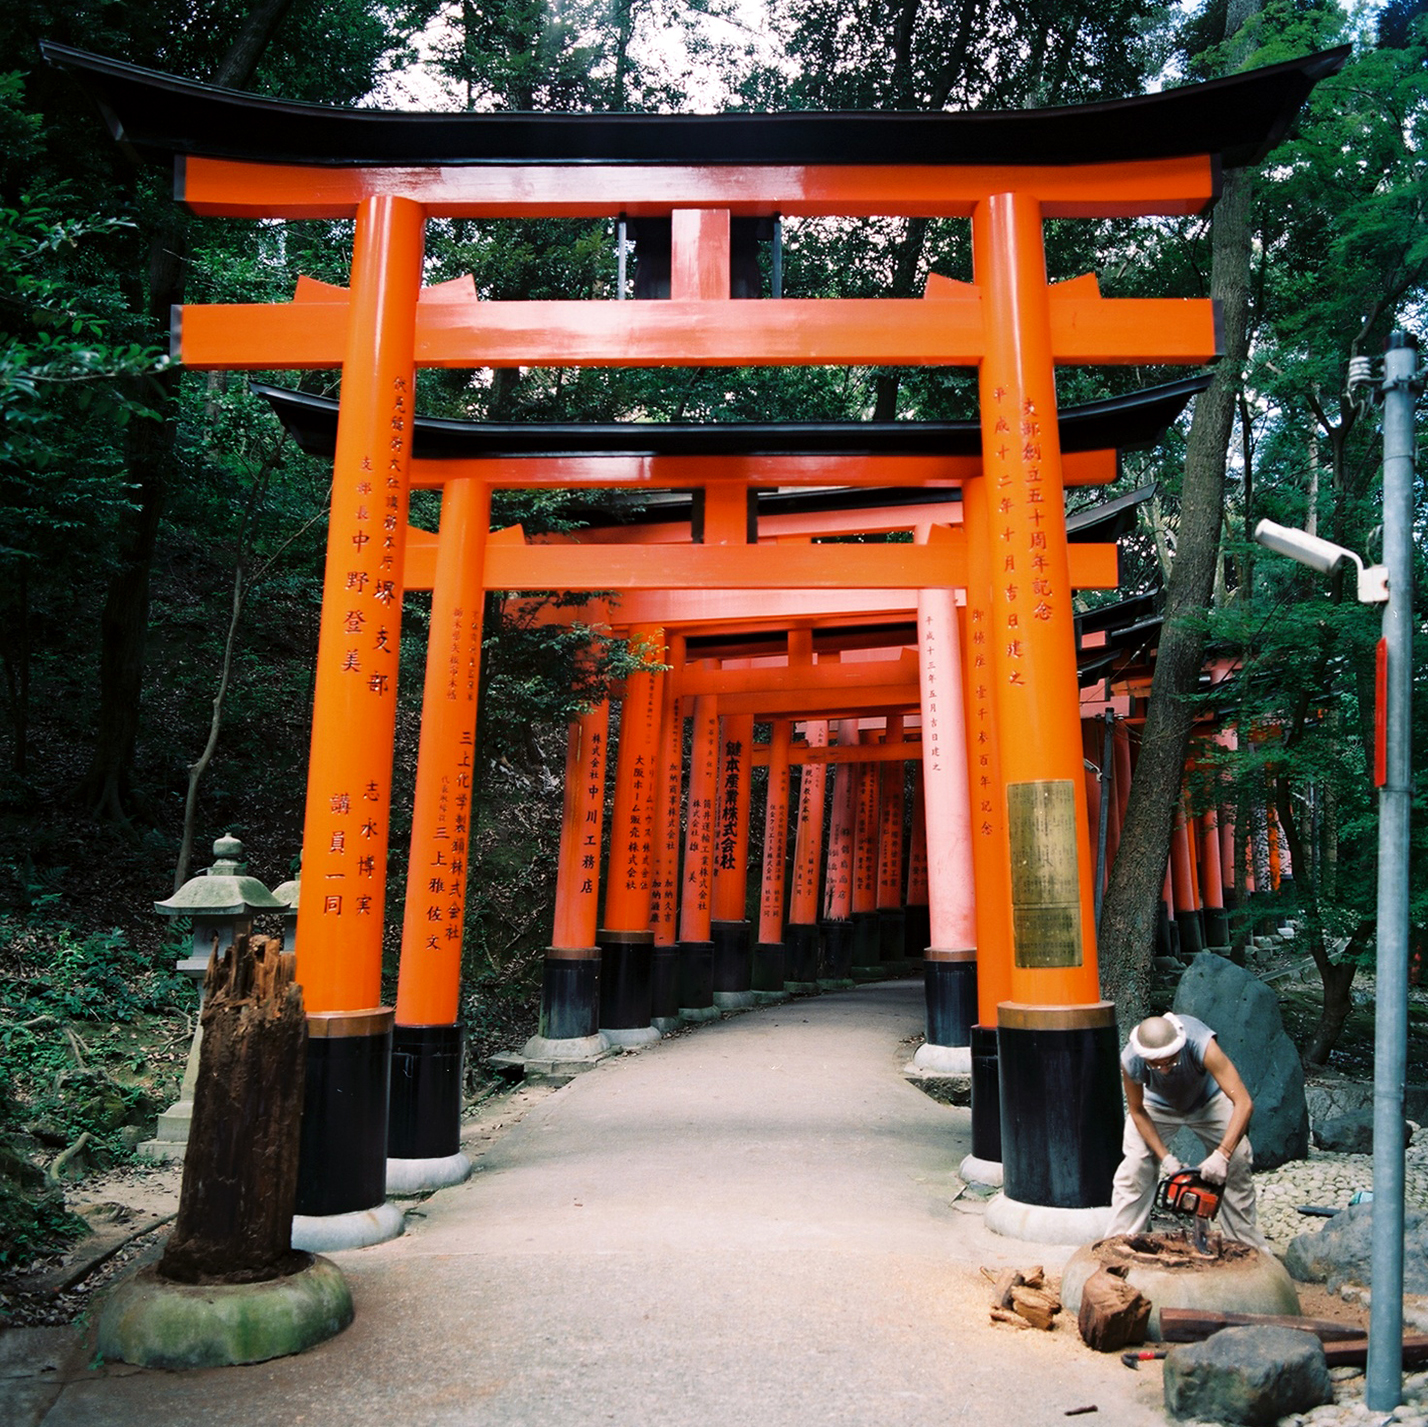 New Torii, Fushimi Inari Taisha, Fushimi-ku, Kyoto, Japan, 2012